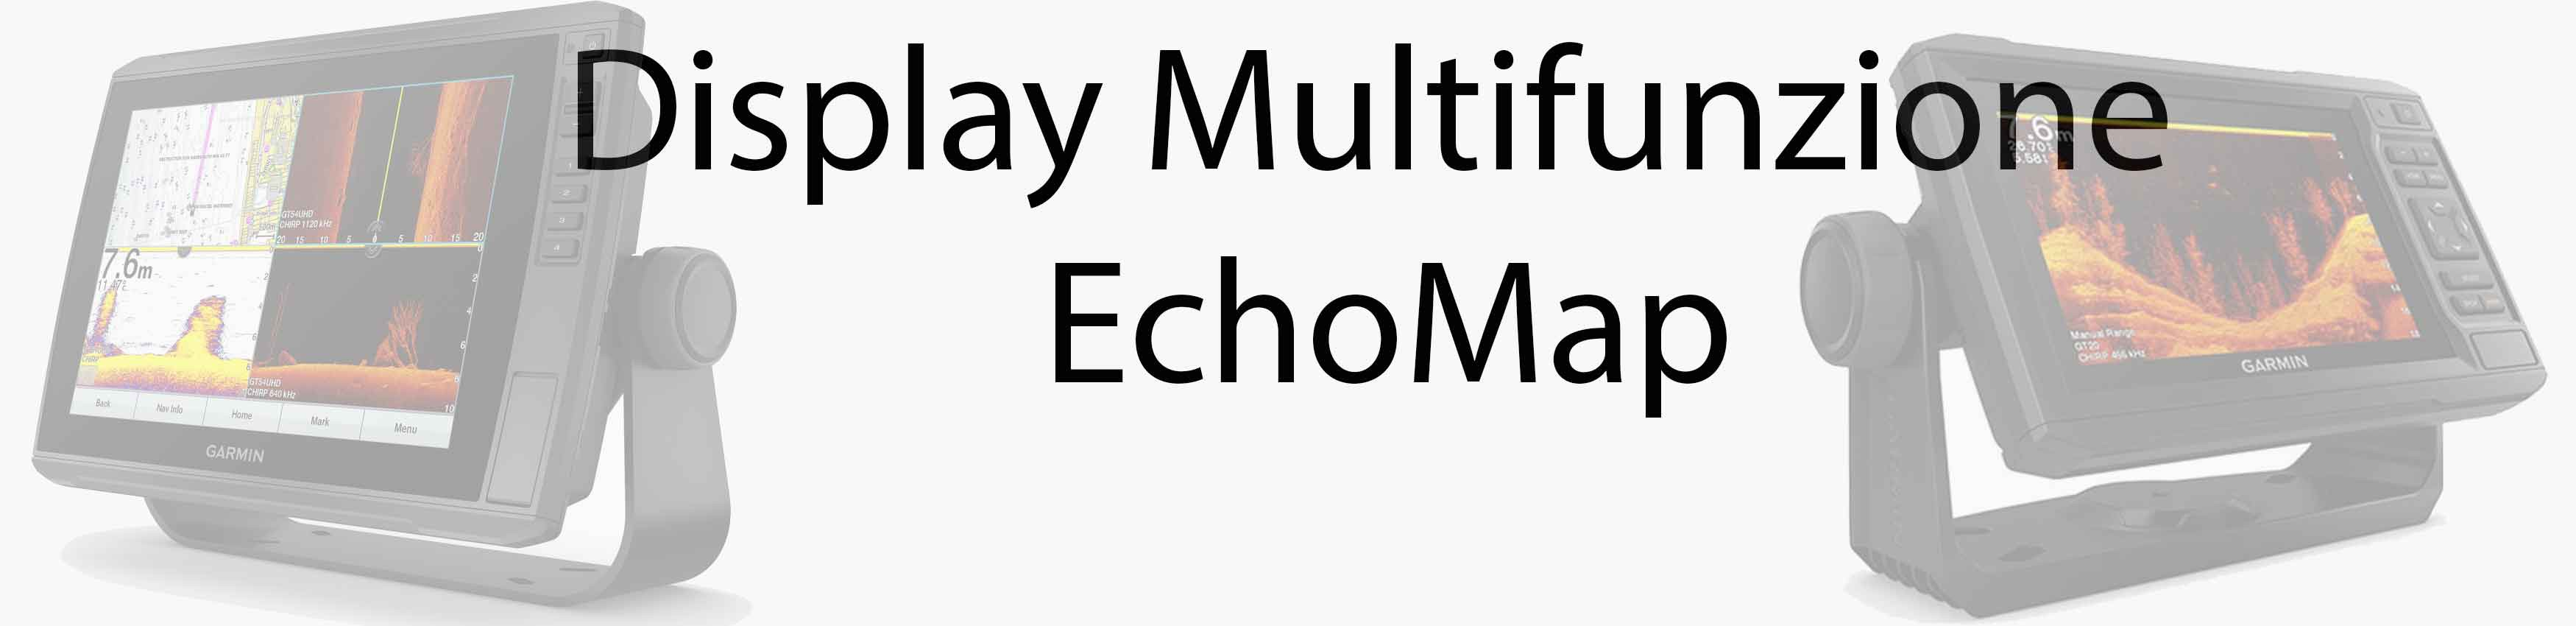 Display Multifunzione EchoMap